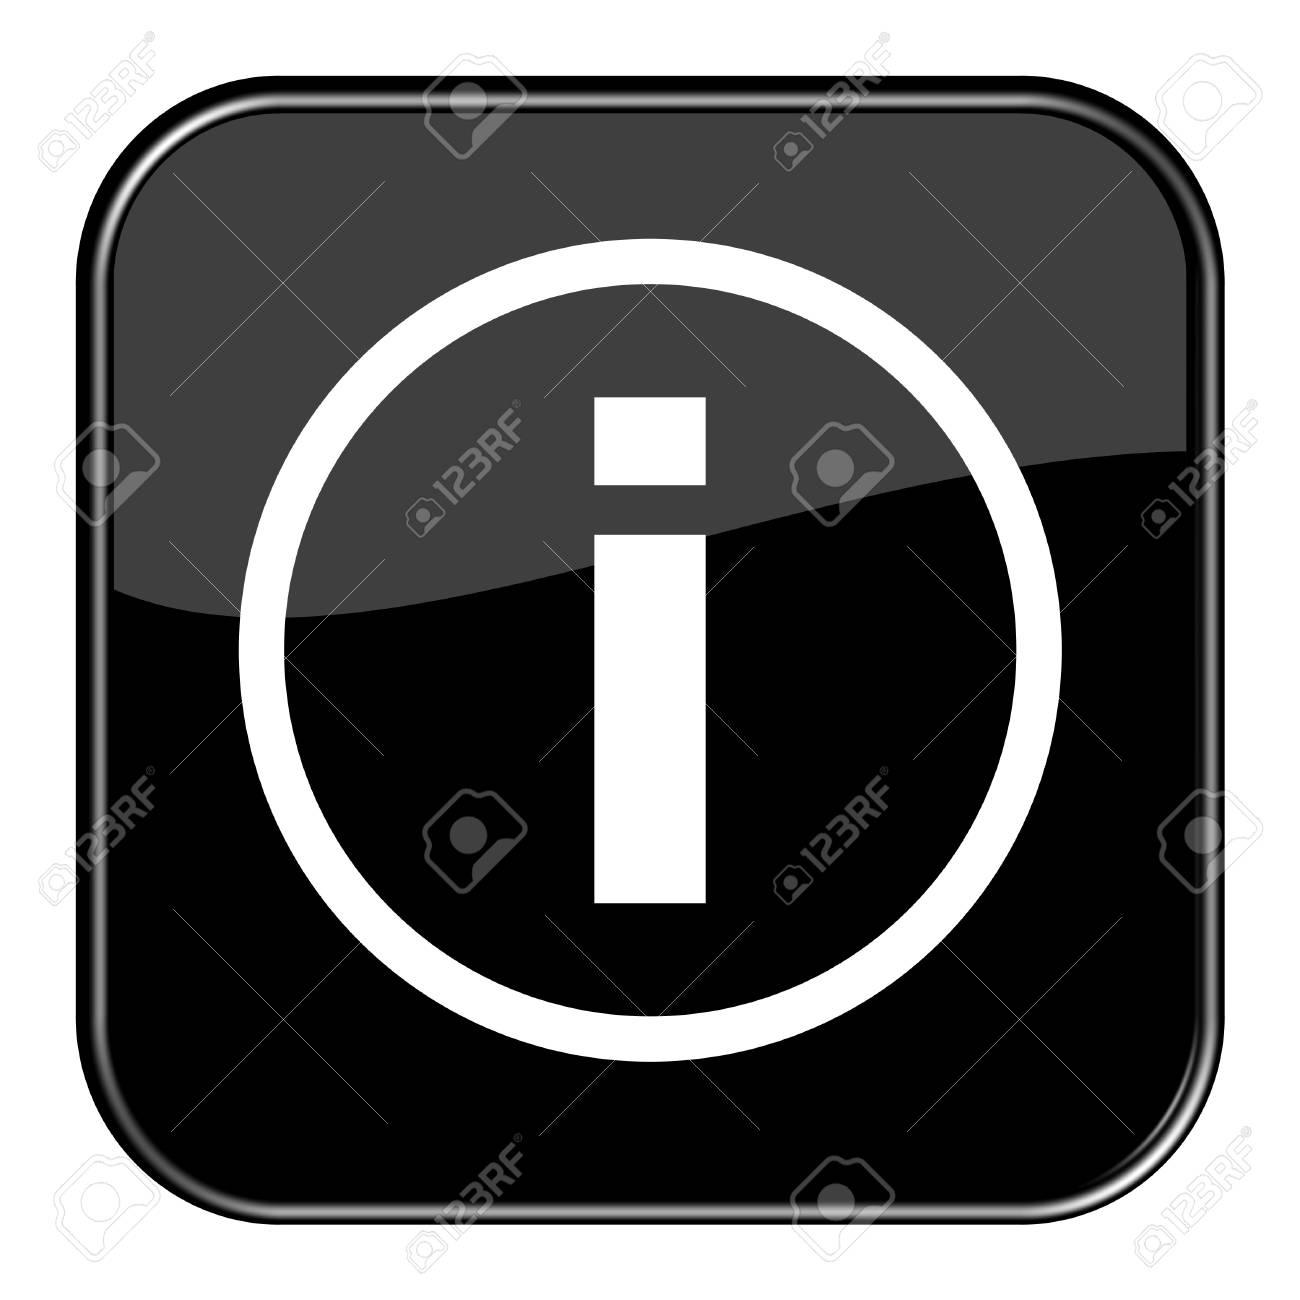 Glossy Button black - Info Stock Photo - 13758411